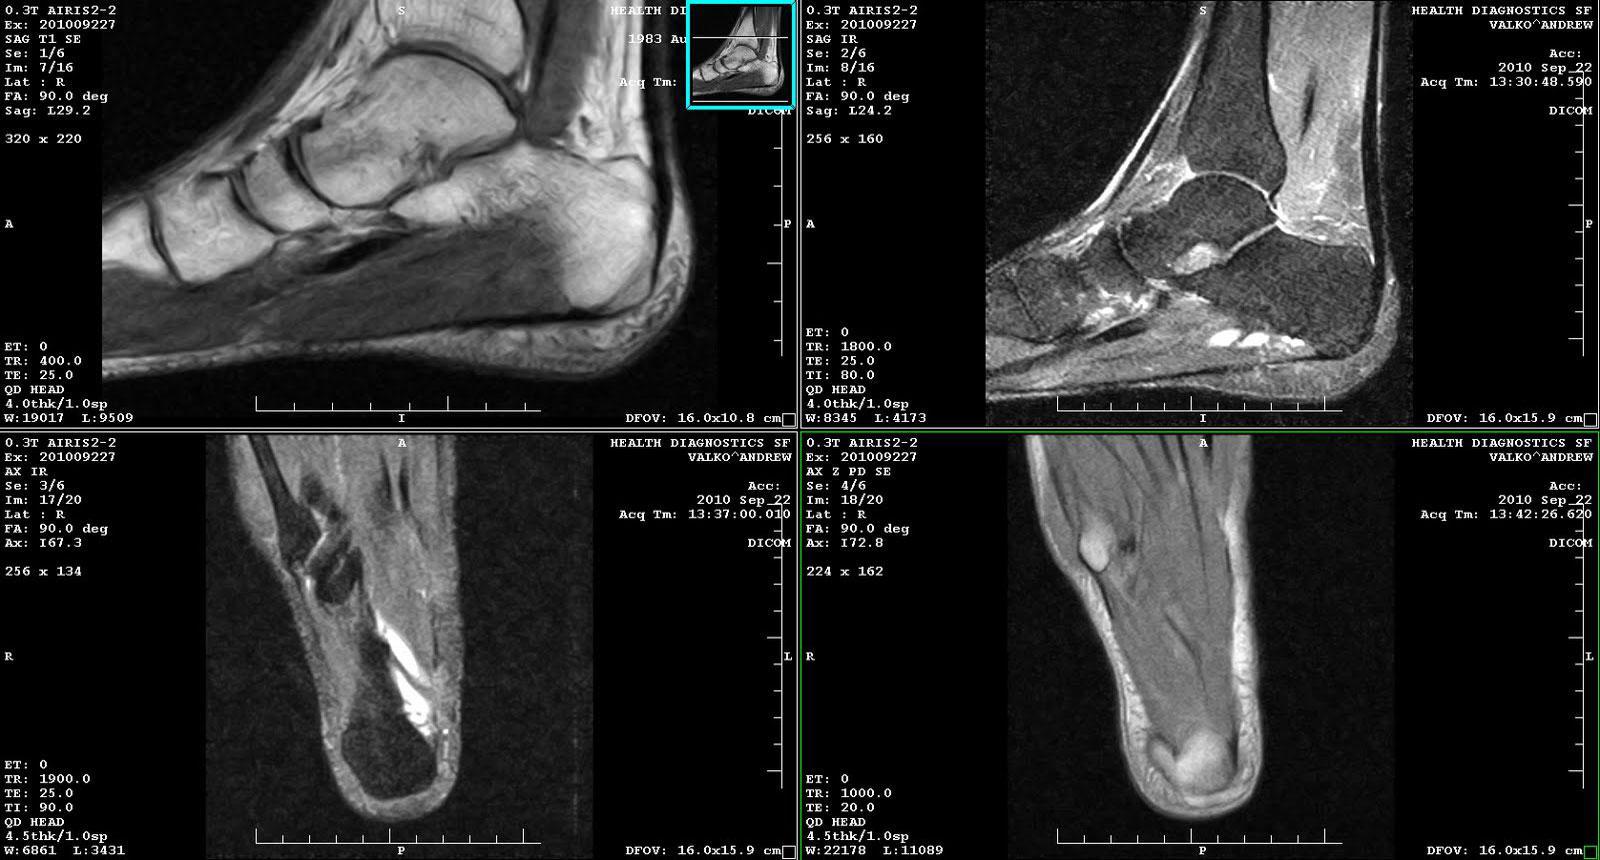 Снимок МРТ стопы